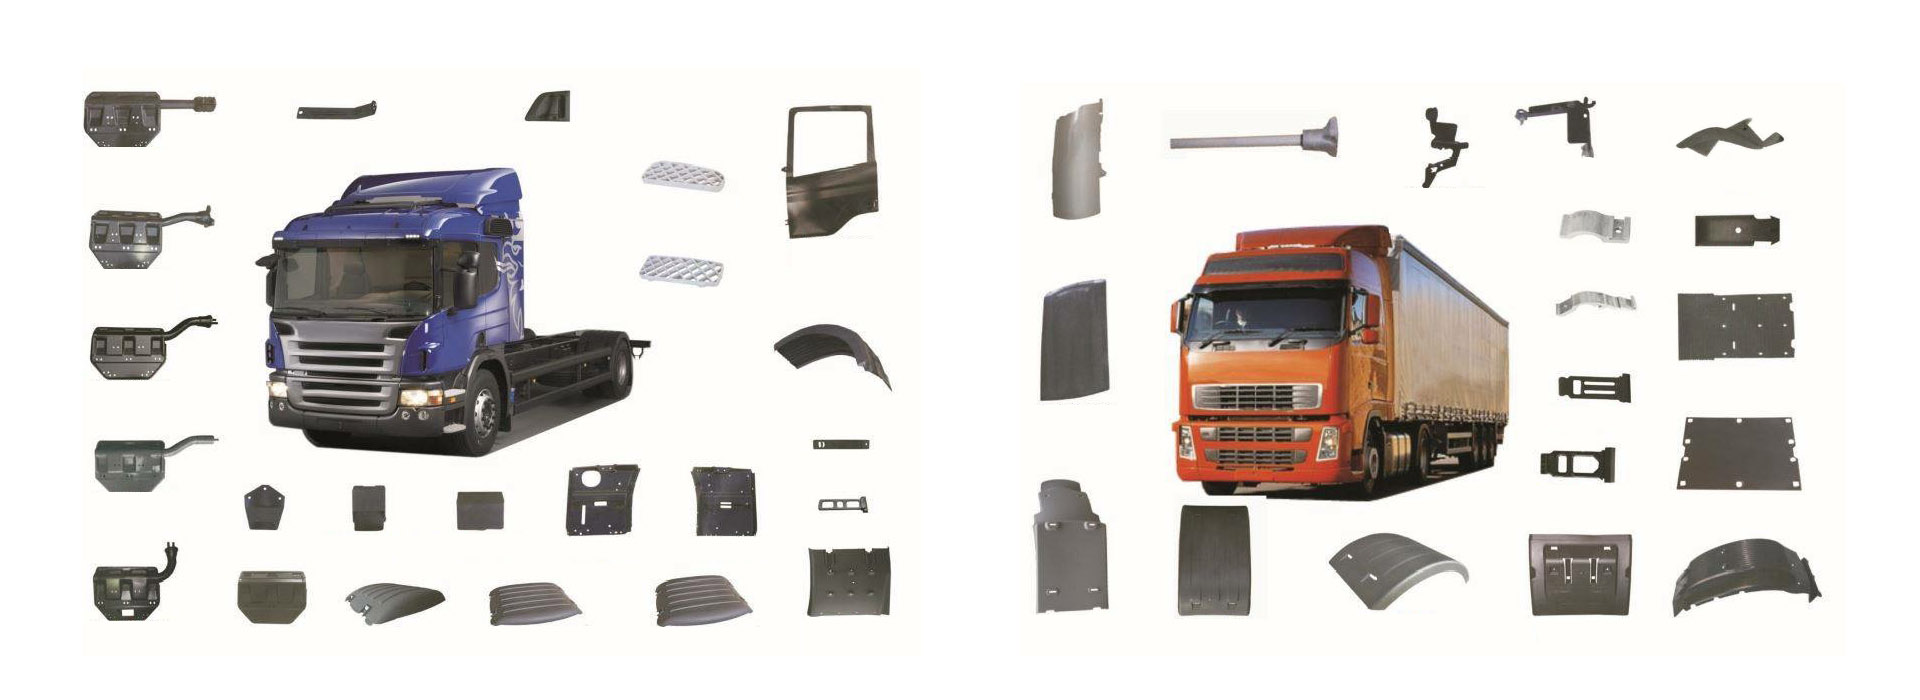 EUROCV-volvo卡车配件_scania卡车配件_volvo重卡配件_scania重卡配件